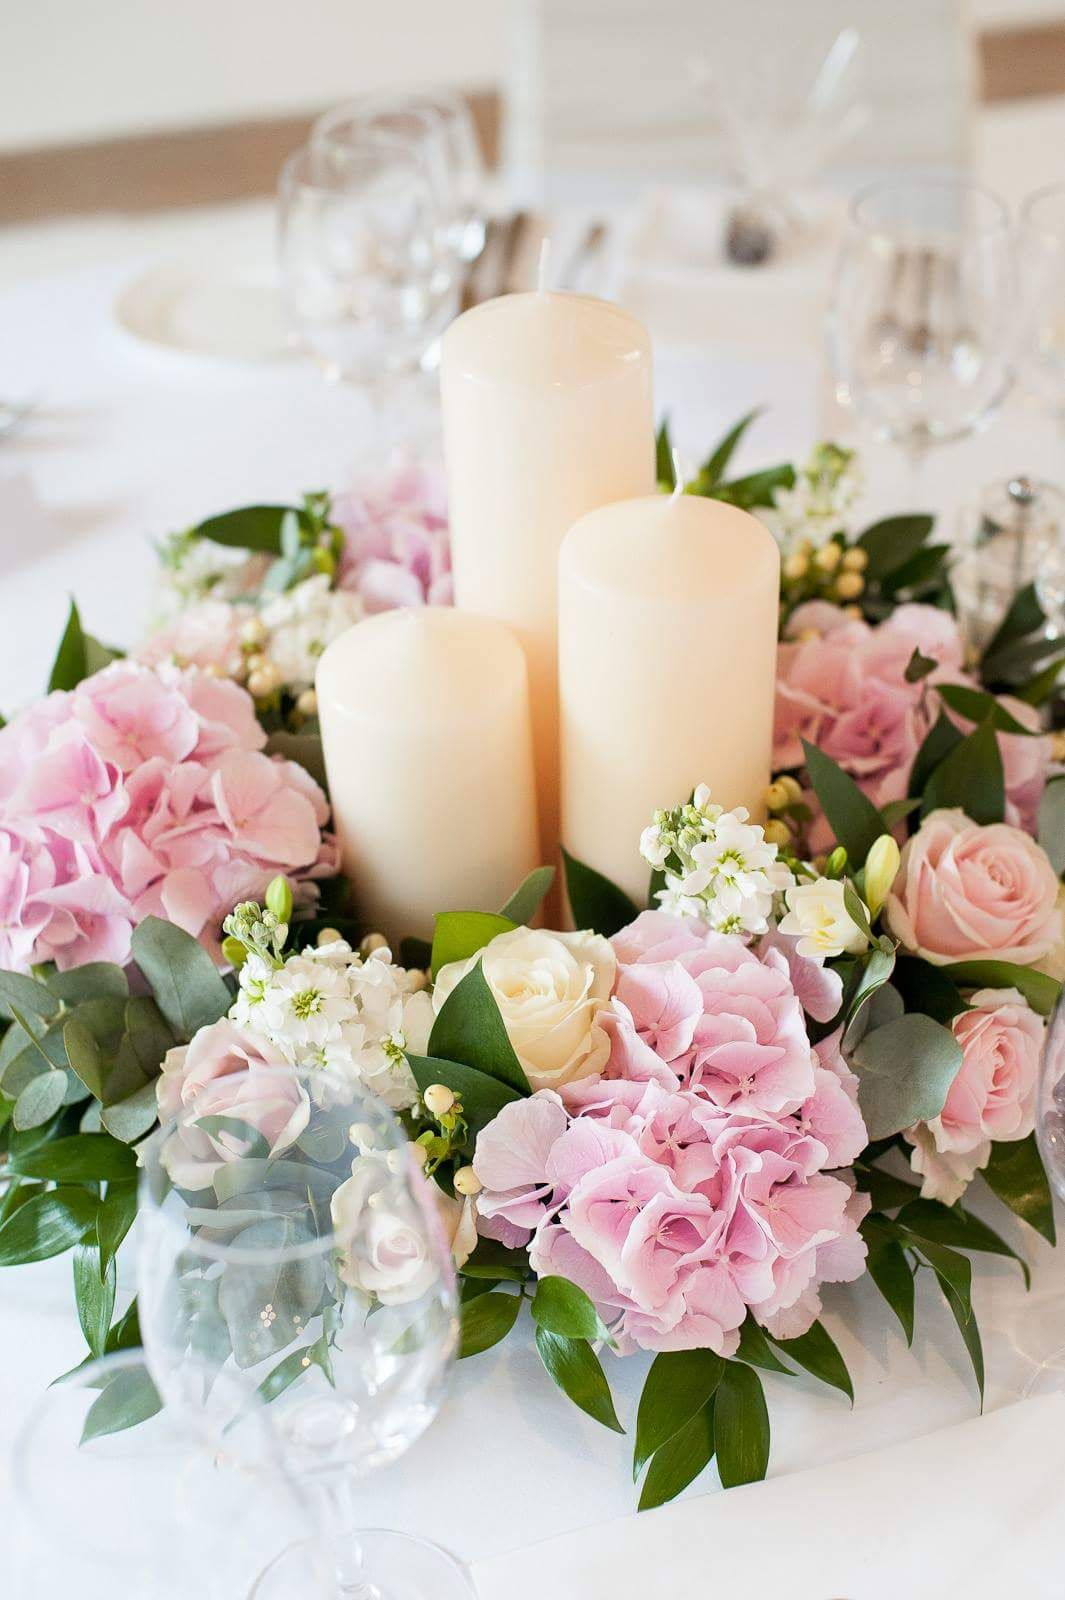 Hydrangea Rose Pink White Ivory Low Candle Arrangement Guest Table Centre Wedding Kent London Chi Decoration Mariage Fleurs Mariage Deco Mariage